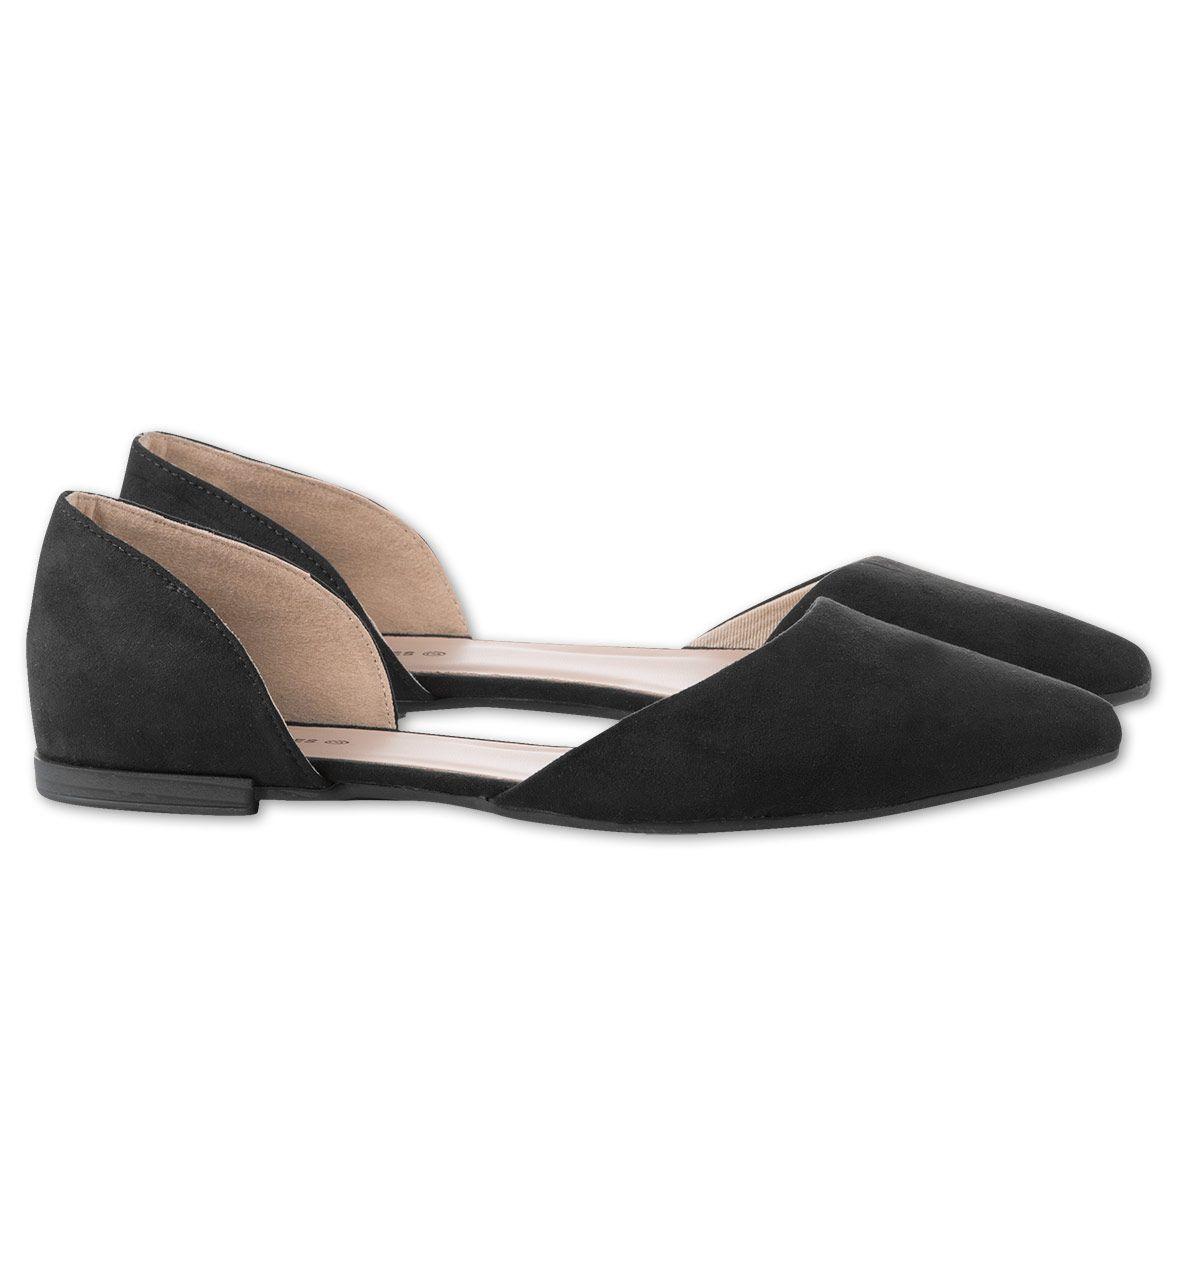 Baleriny Mule Shoe Shoes Sneakers